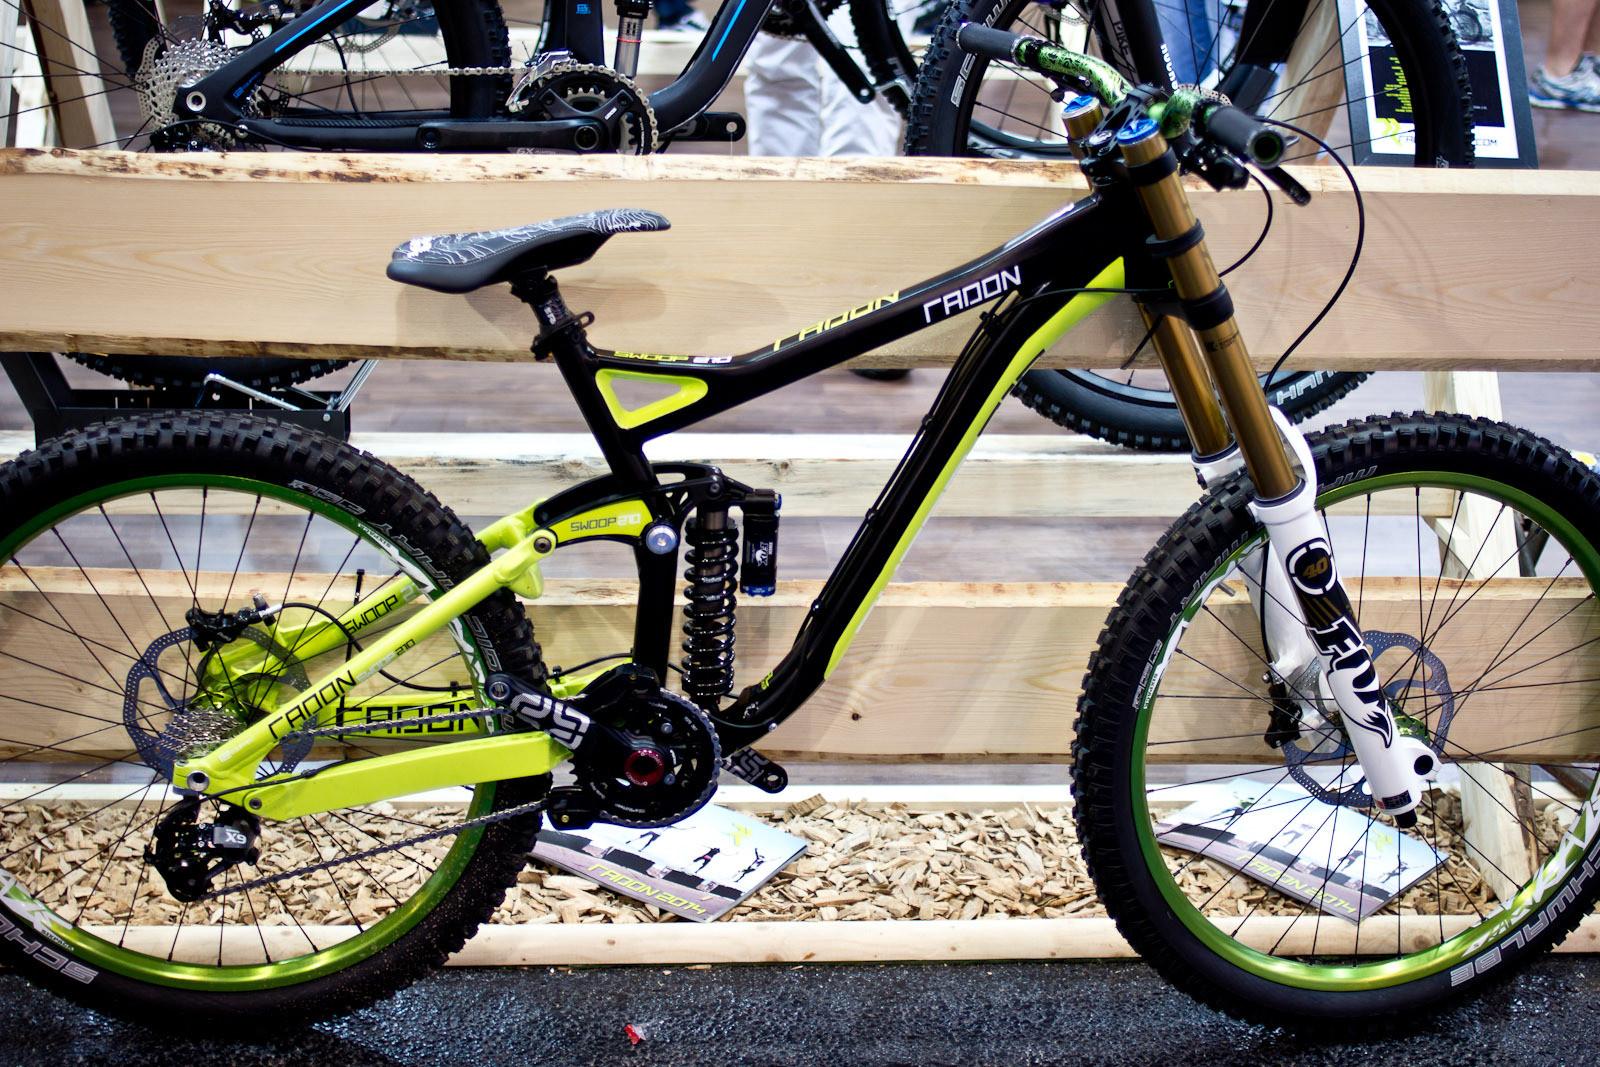 2014 Radon Swoop 210 DH Bike - 2014 Downhill Bikes at Eurobike 2013 - Mountain Biking Pictures - Vital MTB